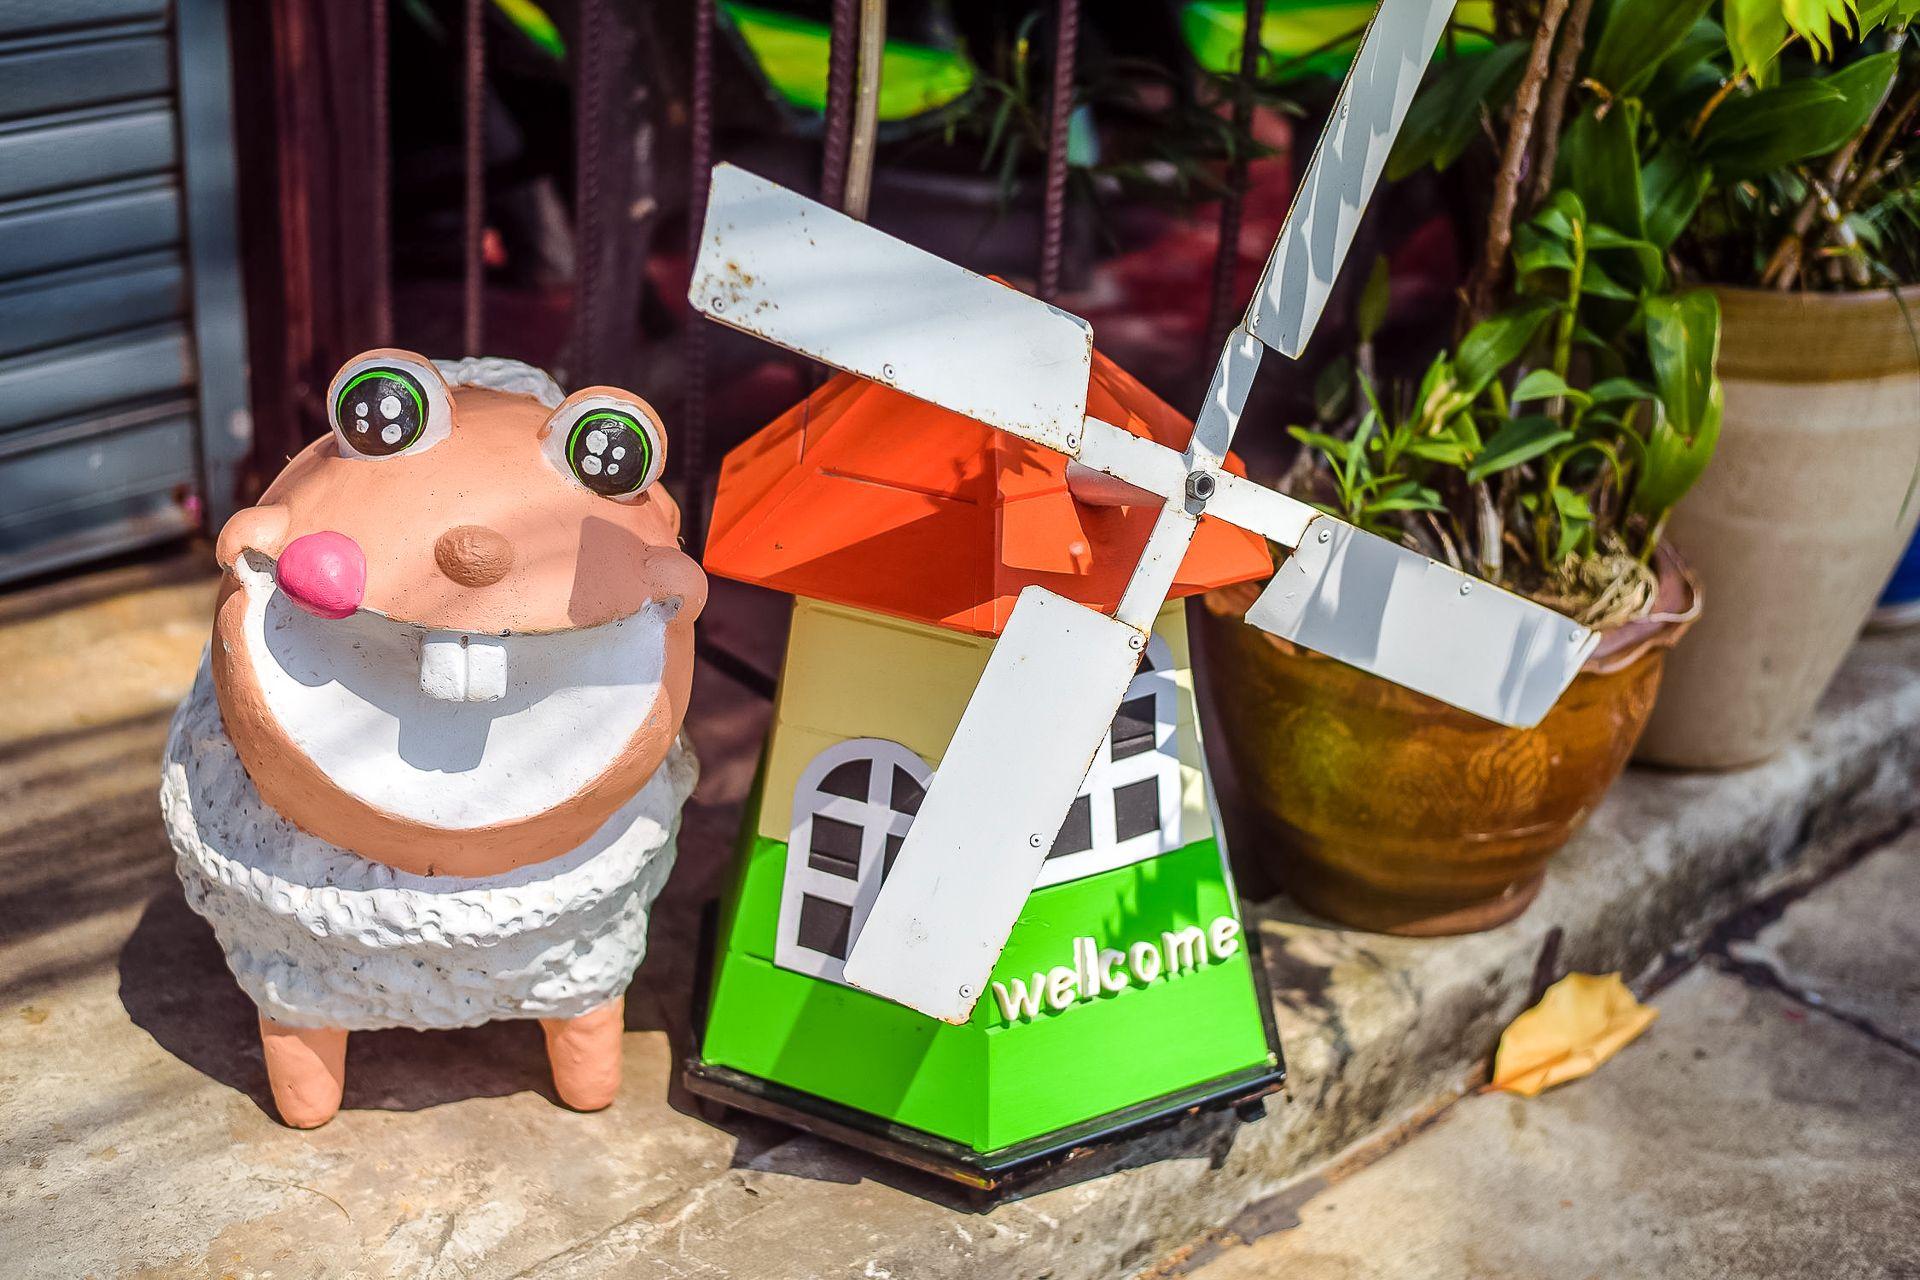 улыбка, Таиланд, Тайланд, тайская улыбка, тайцы, смайл, позитив, лето, солнце, овечка, веселая овечка, мельница, декор для сада